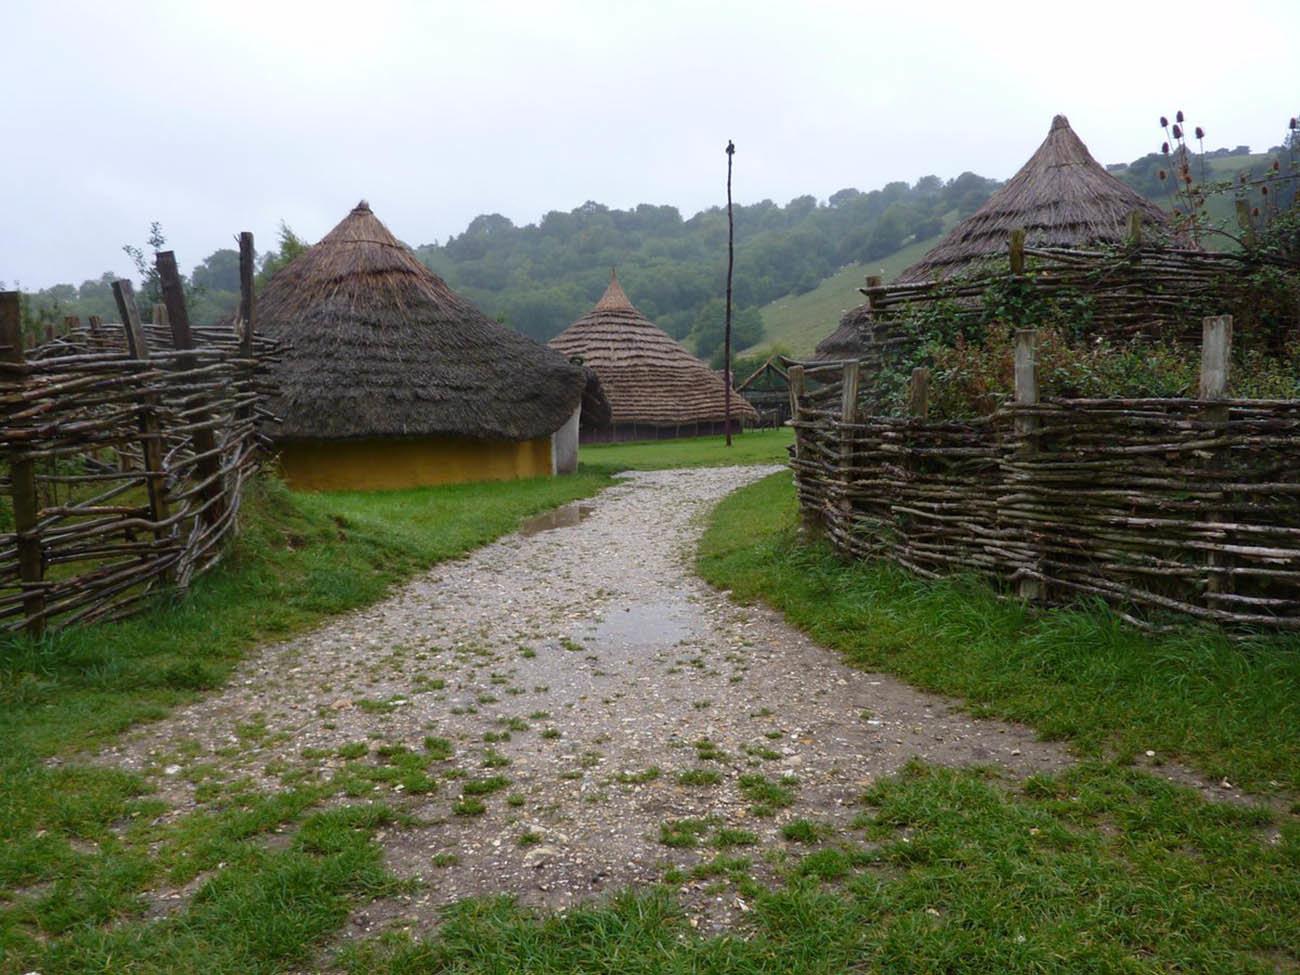 duropolis celta